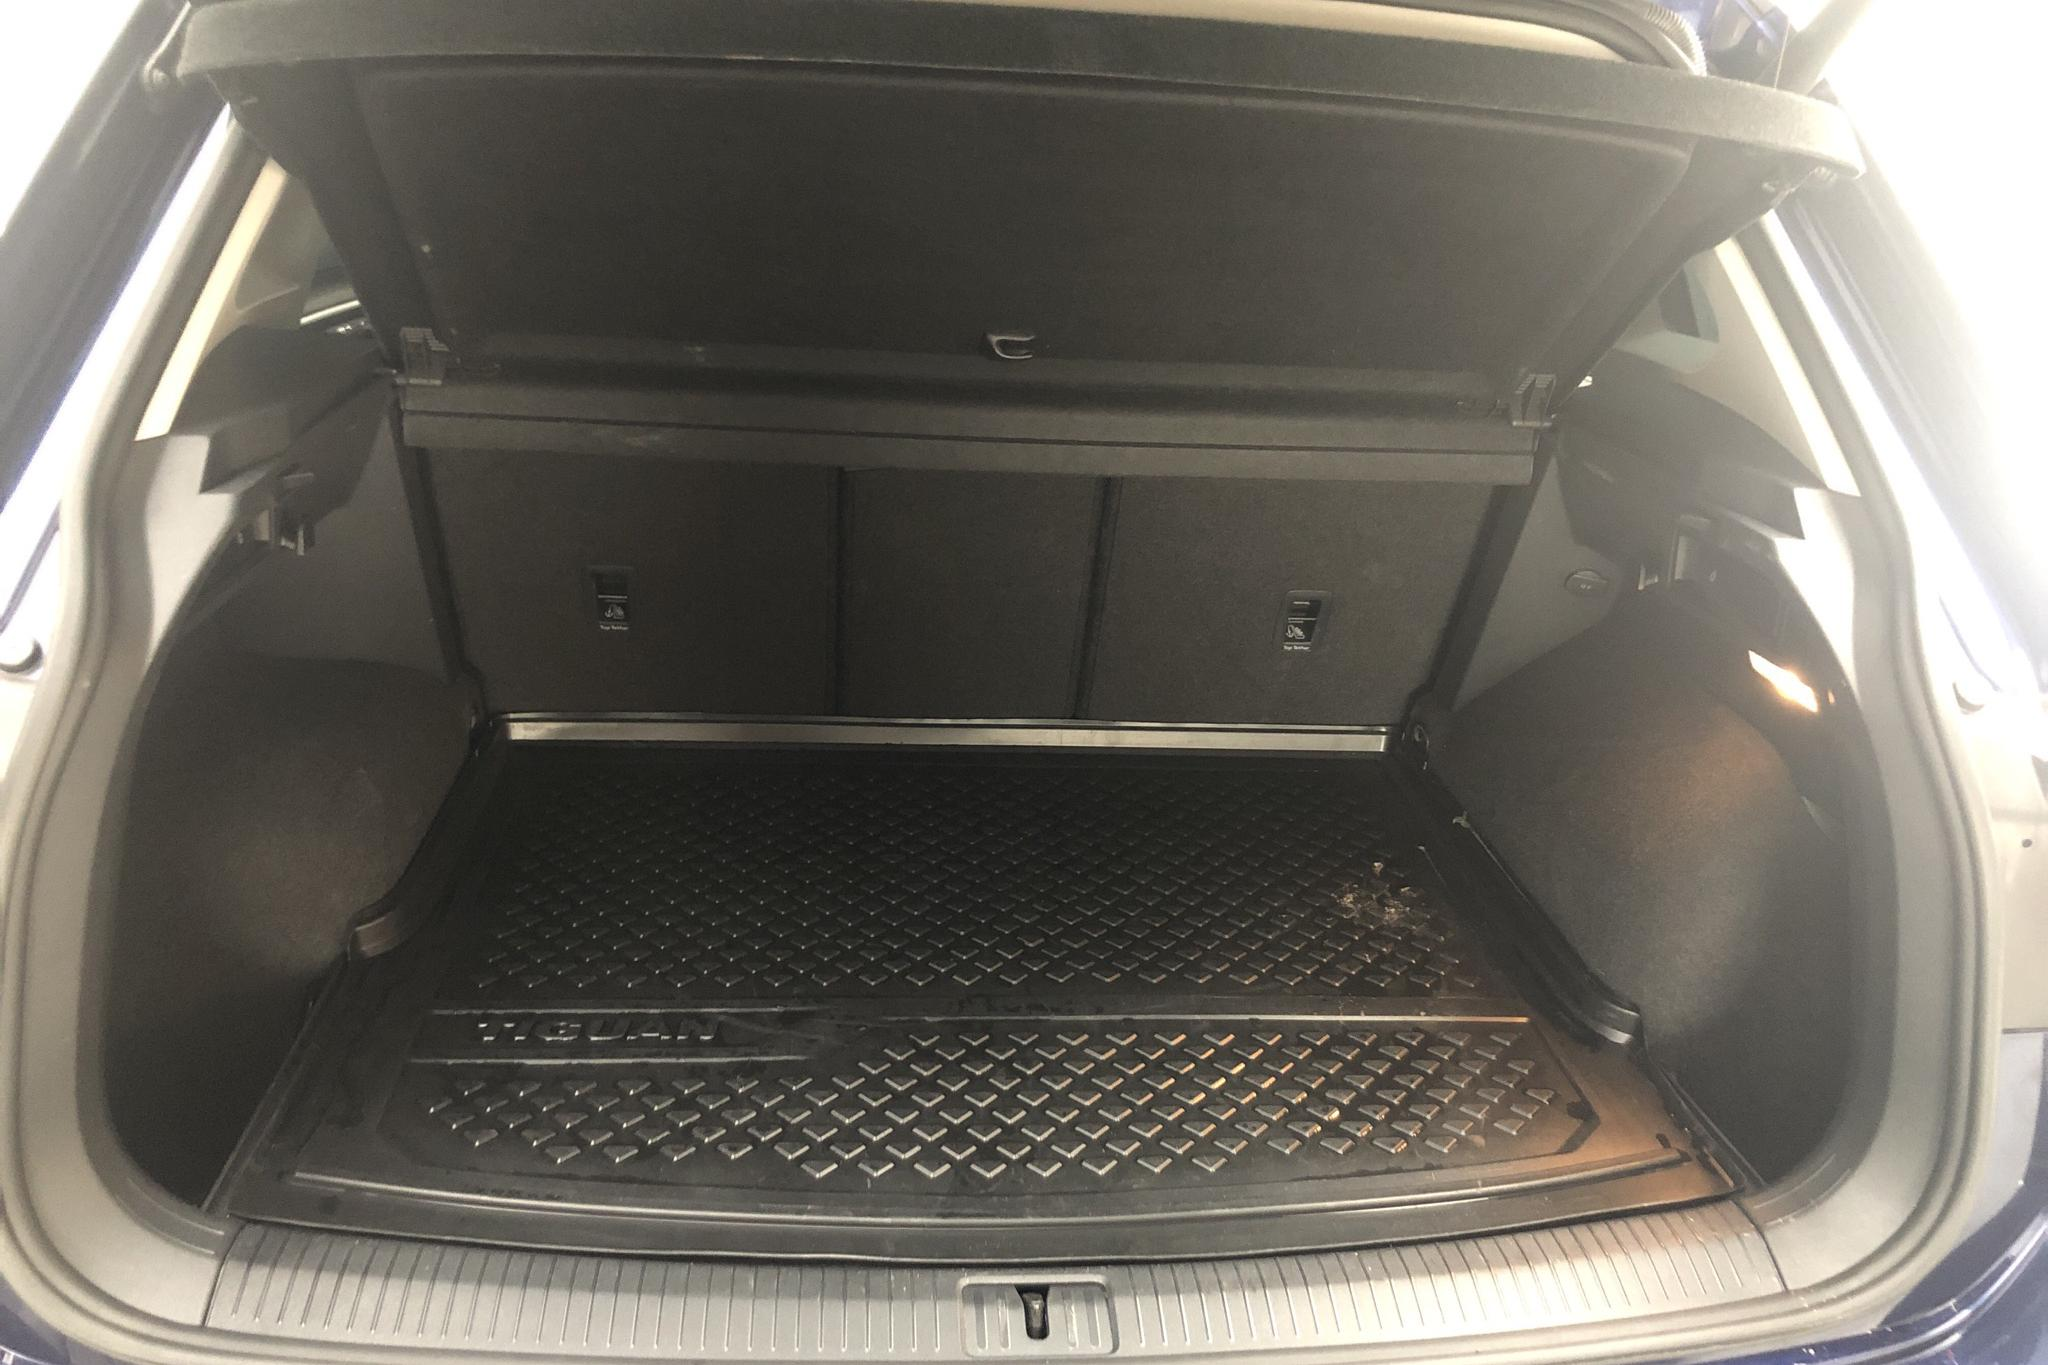 VW Tiguan 2.0 TDI 4MOTION (190hk) - 57 320 km - Automatic - Dark Blue - 2018